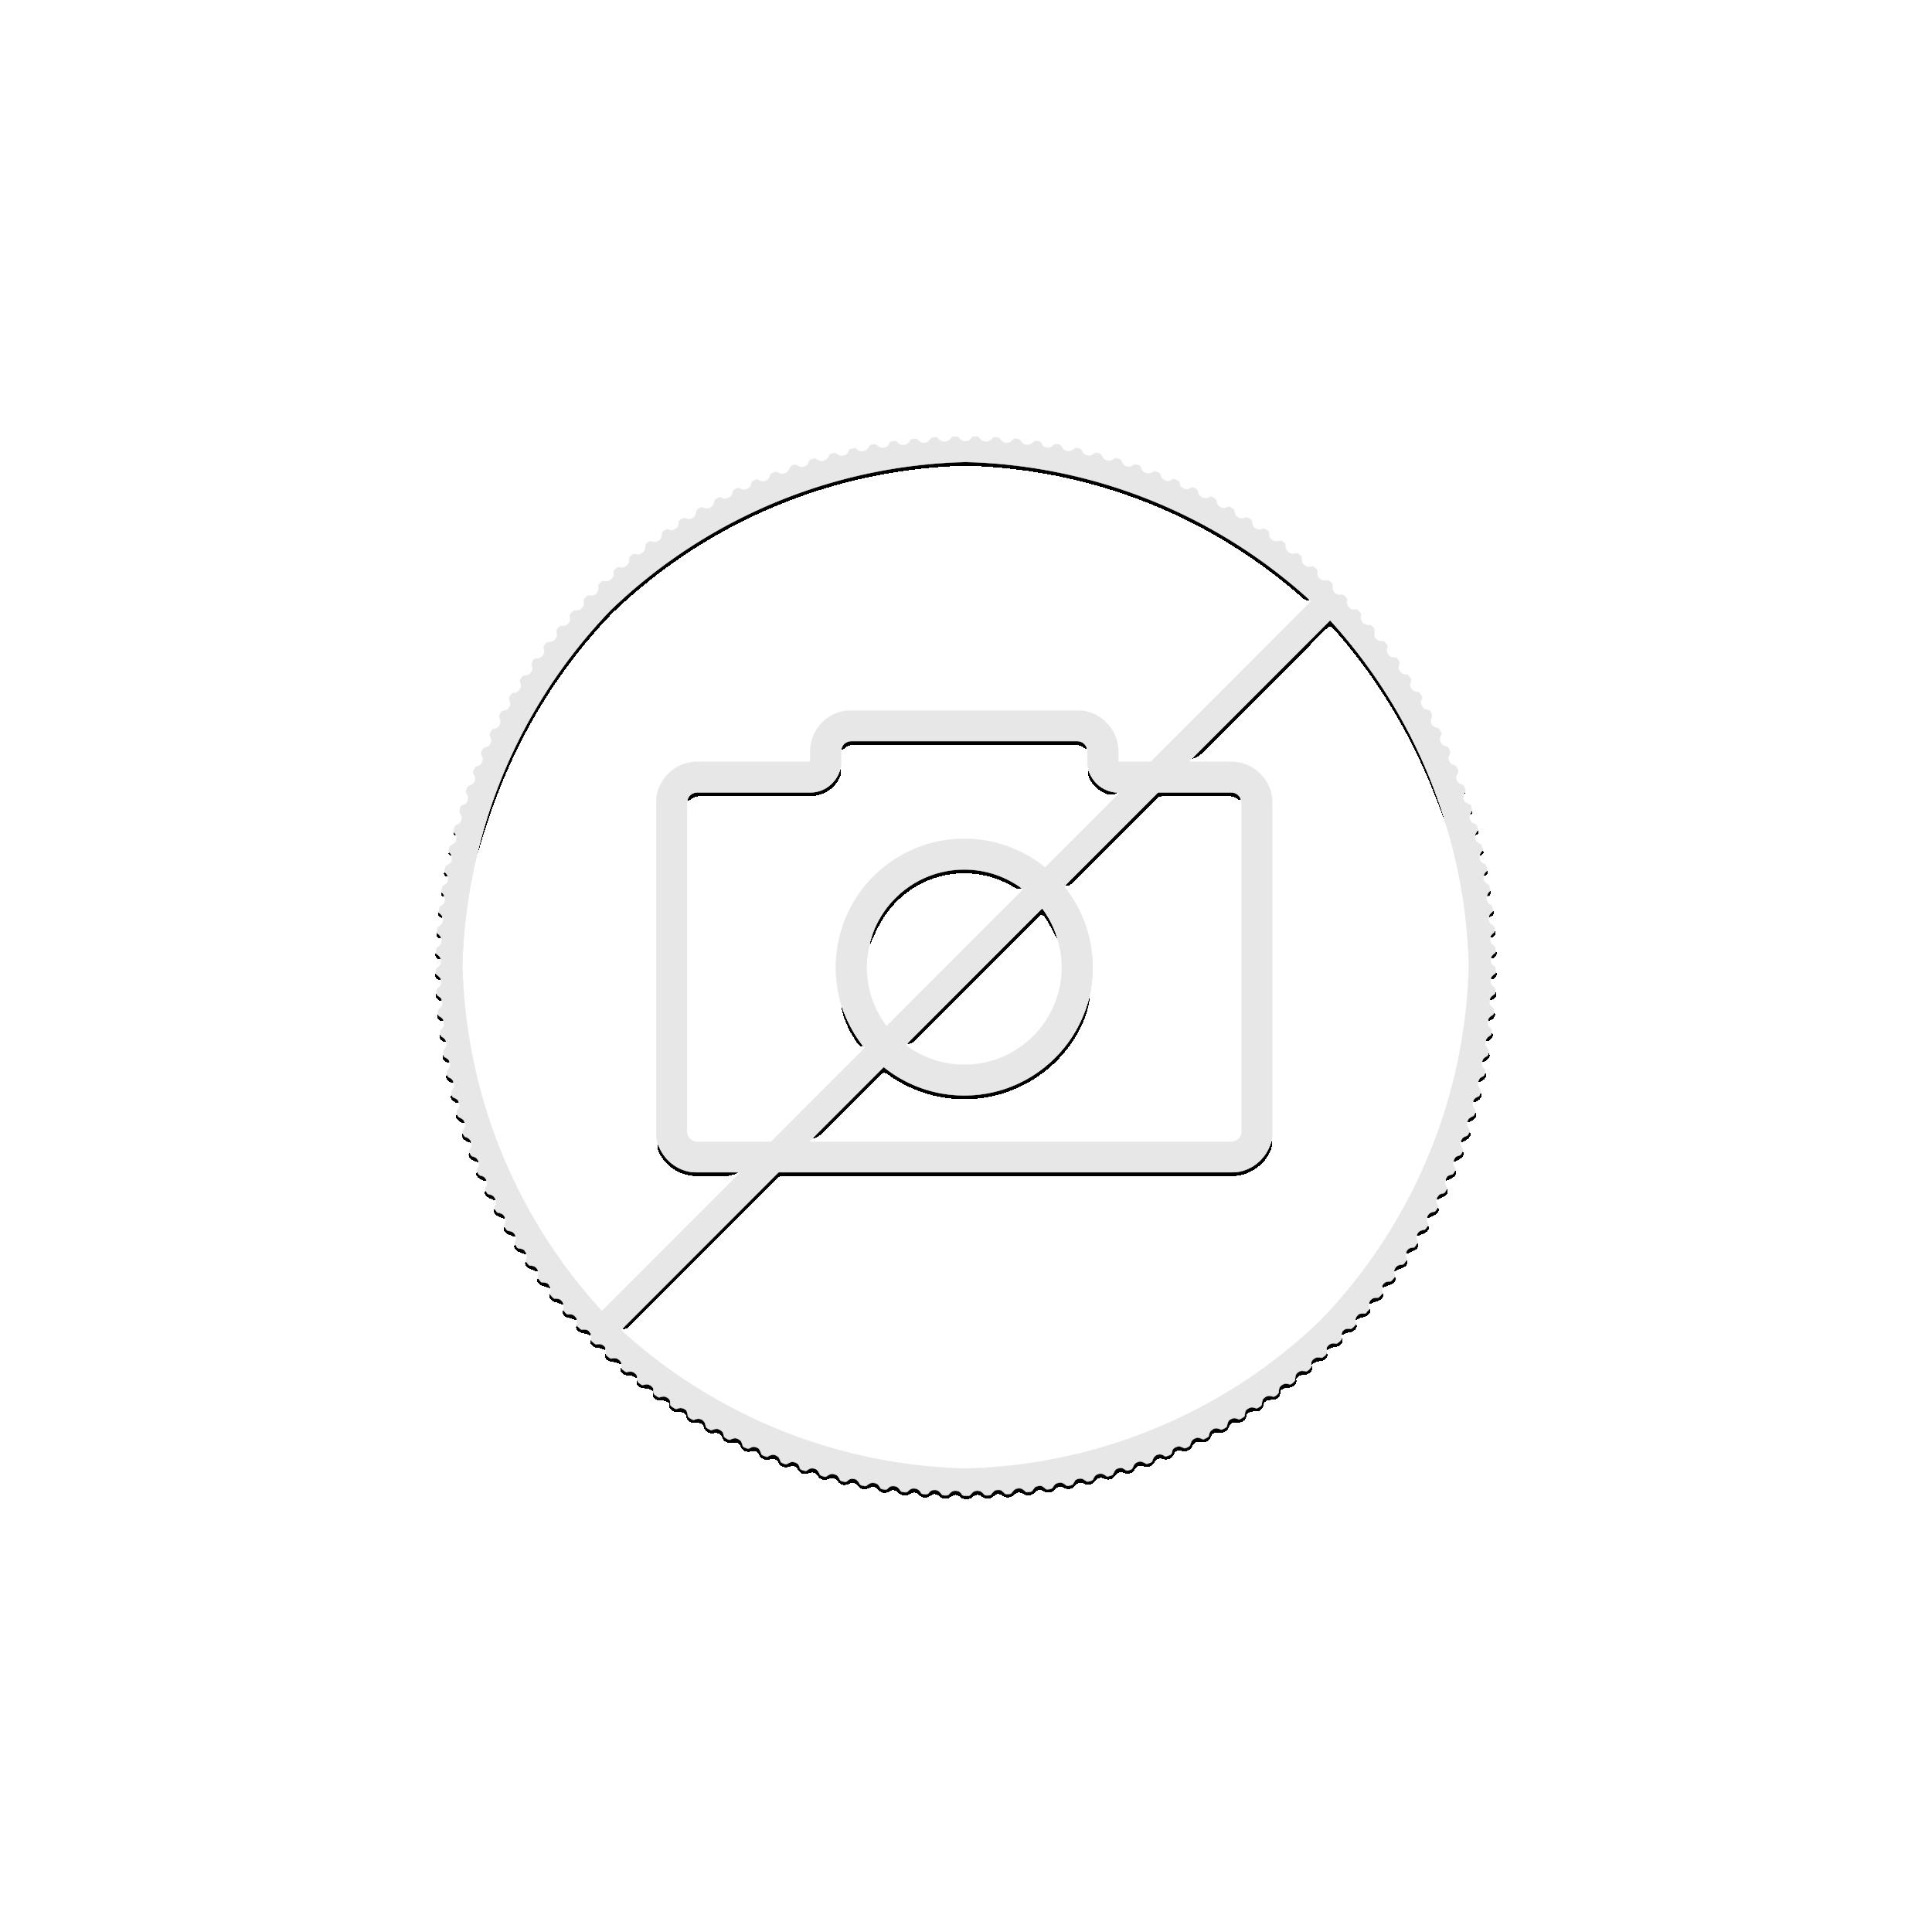 Combibar 20x 1 gram gold bars Valcambi